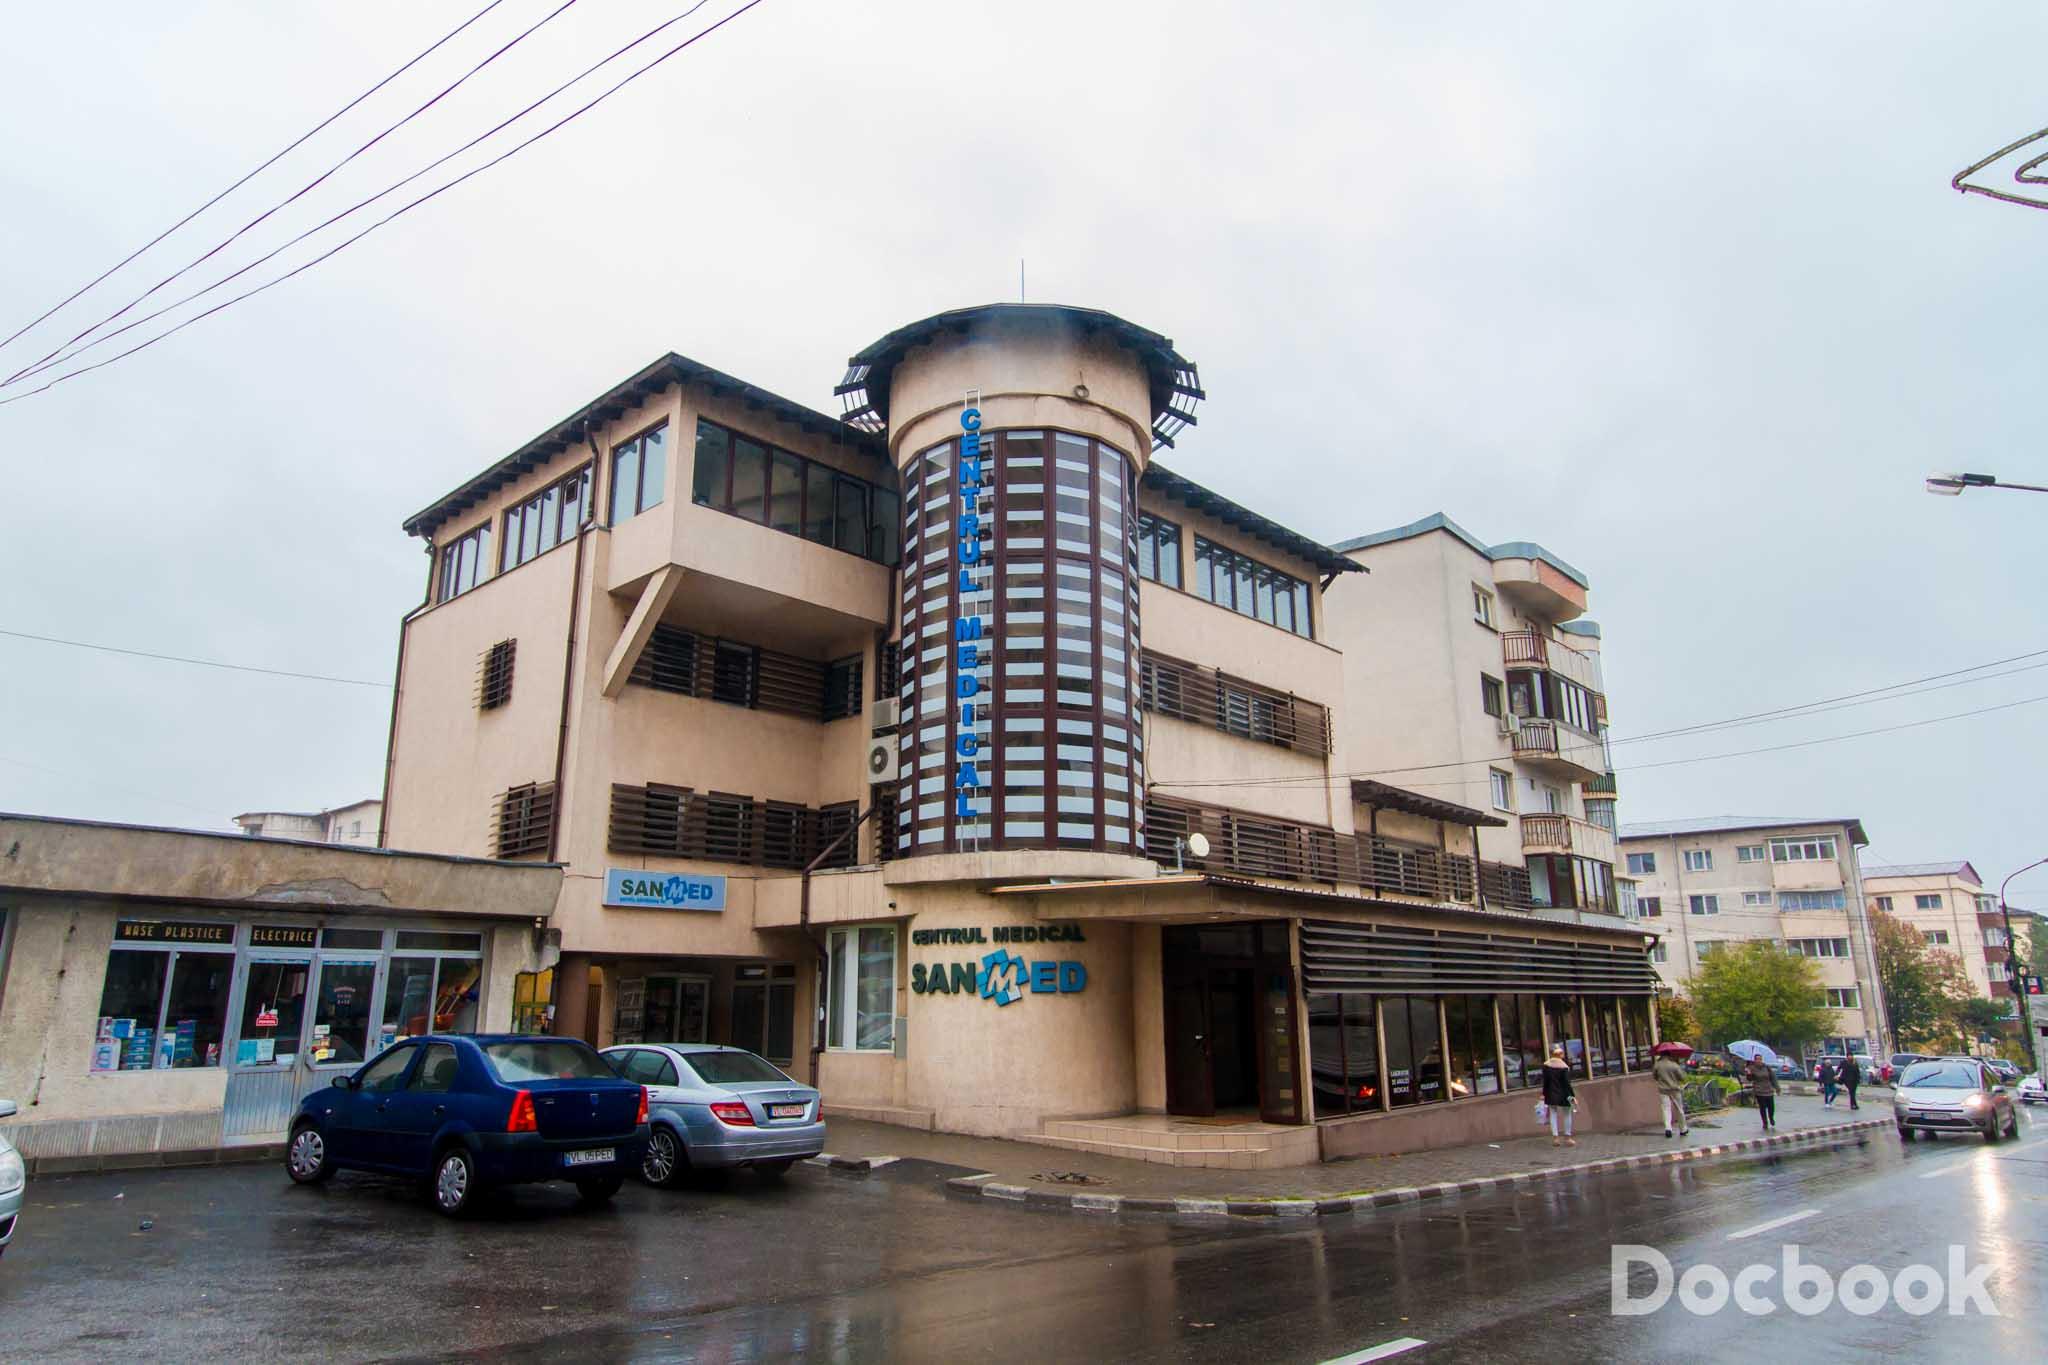 Clinica Sanmed - Valcea